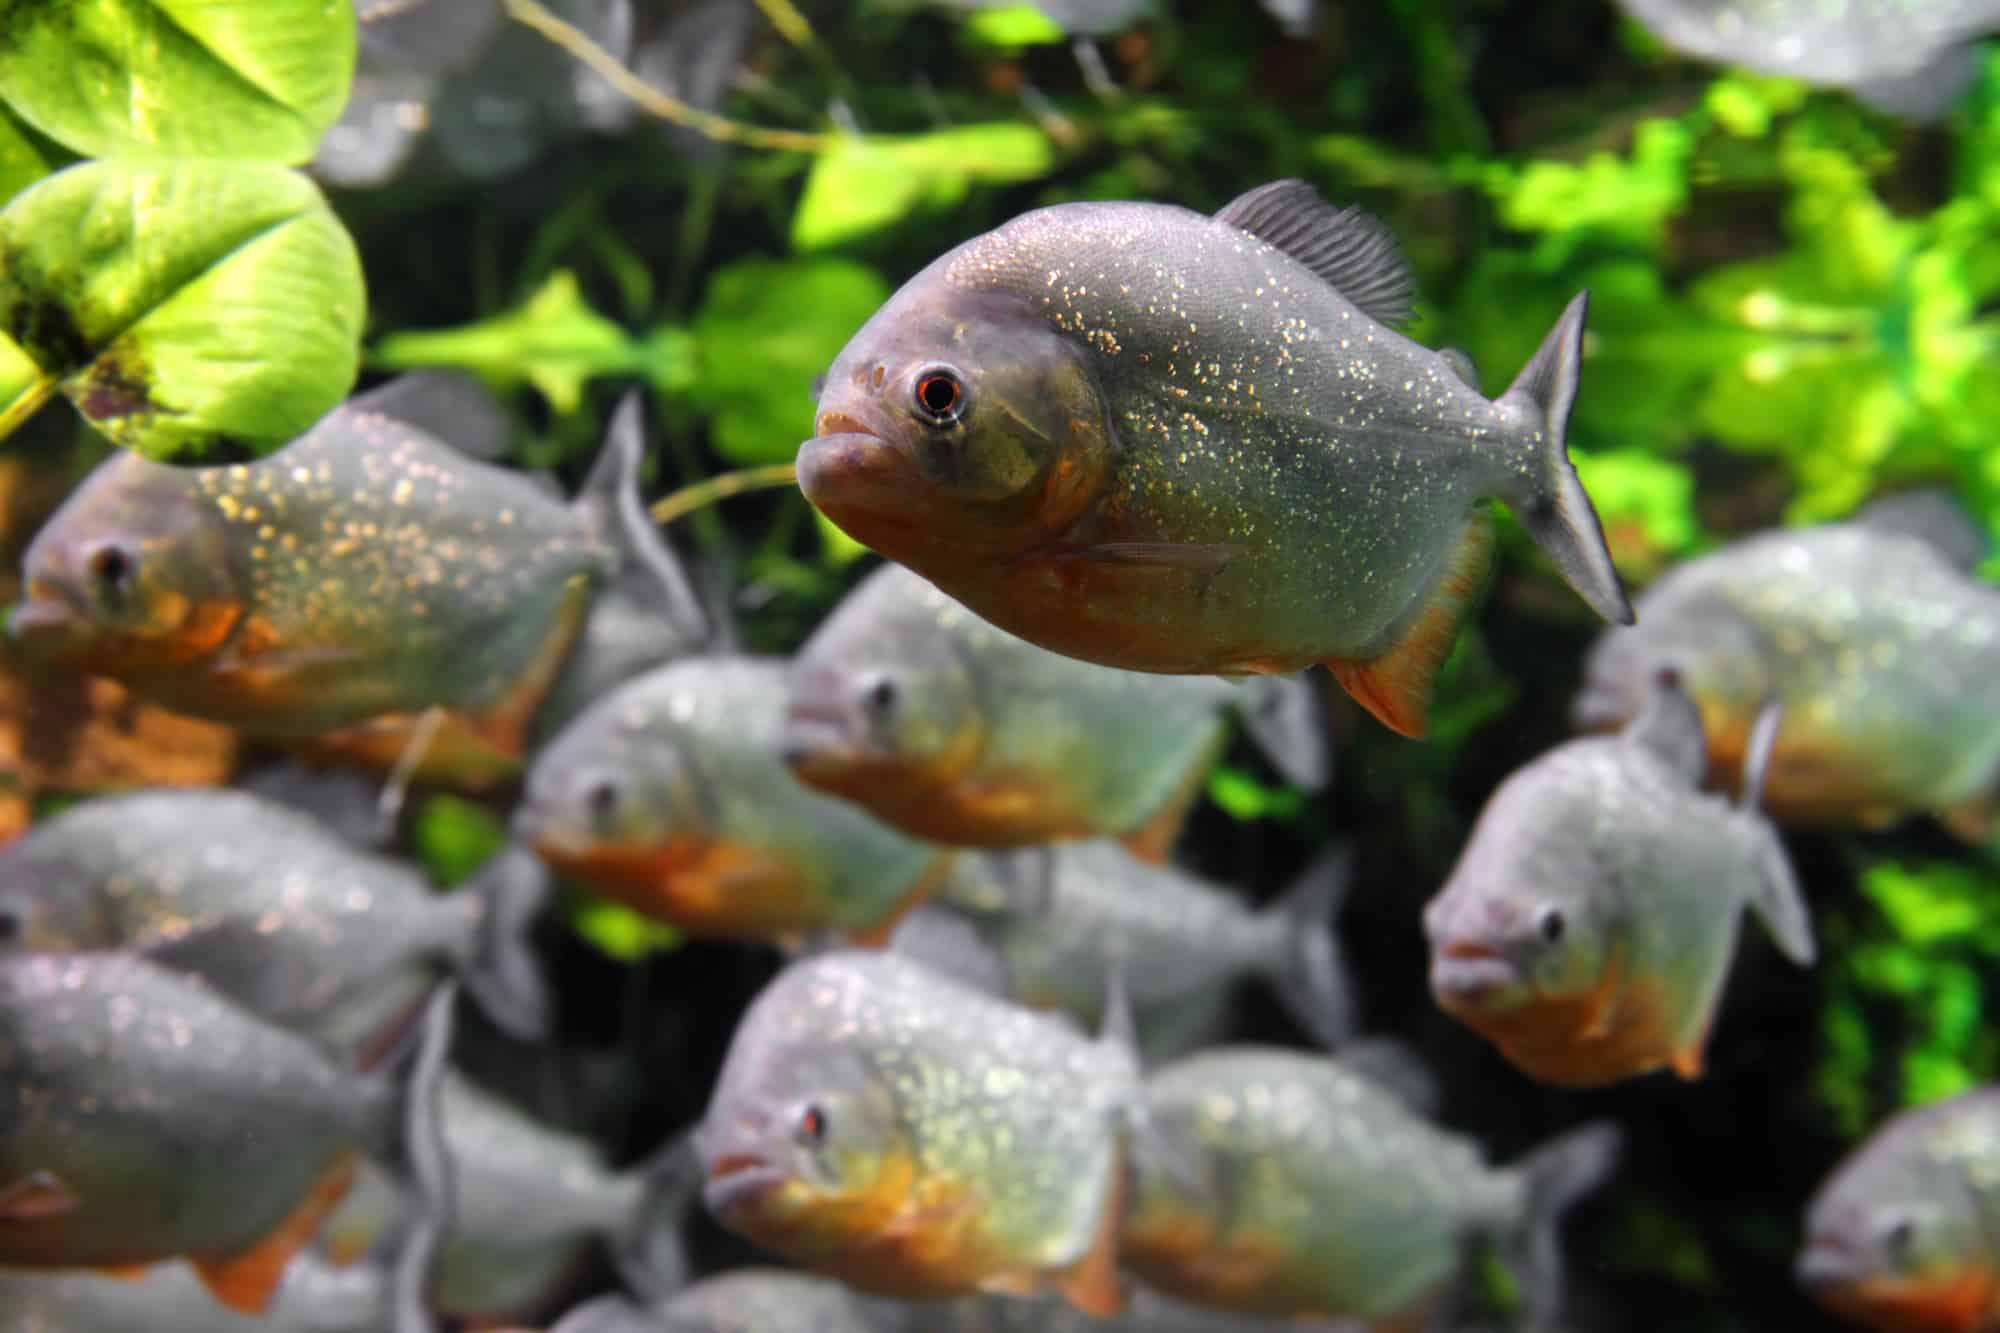 acquario-piranha-allestimento-i-primi-passi-1